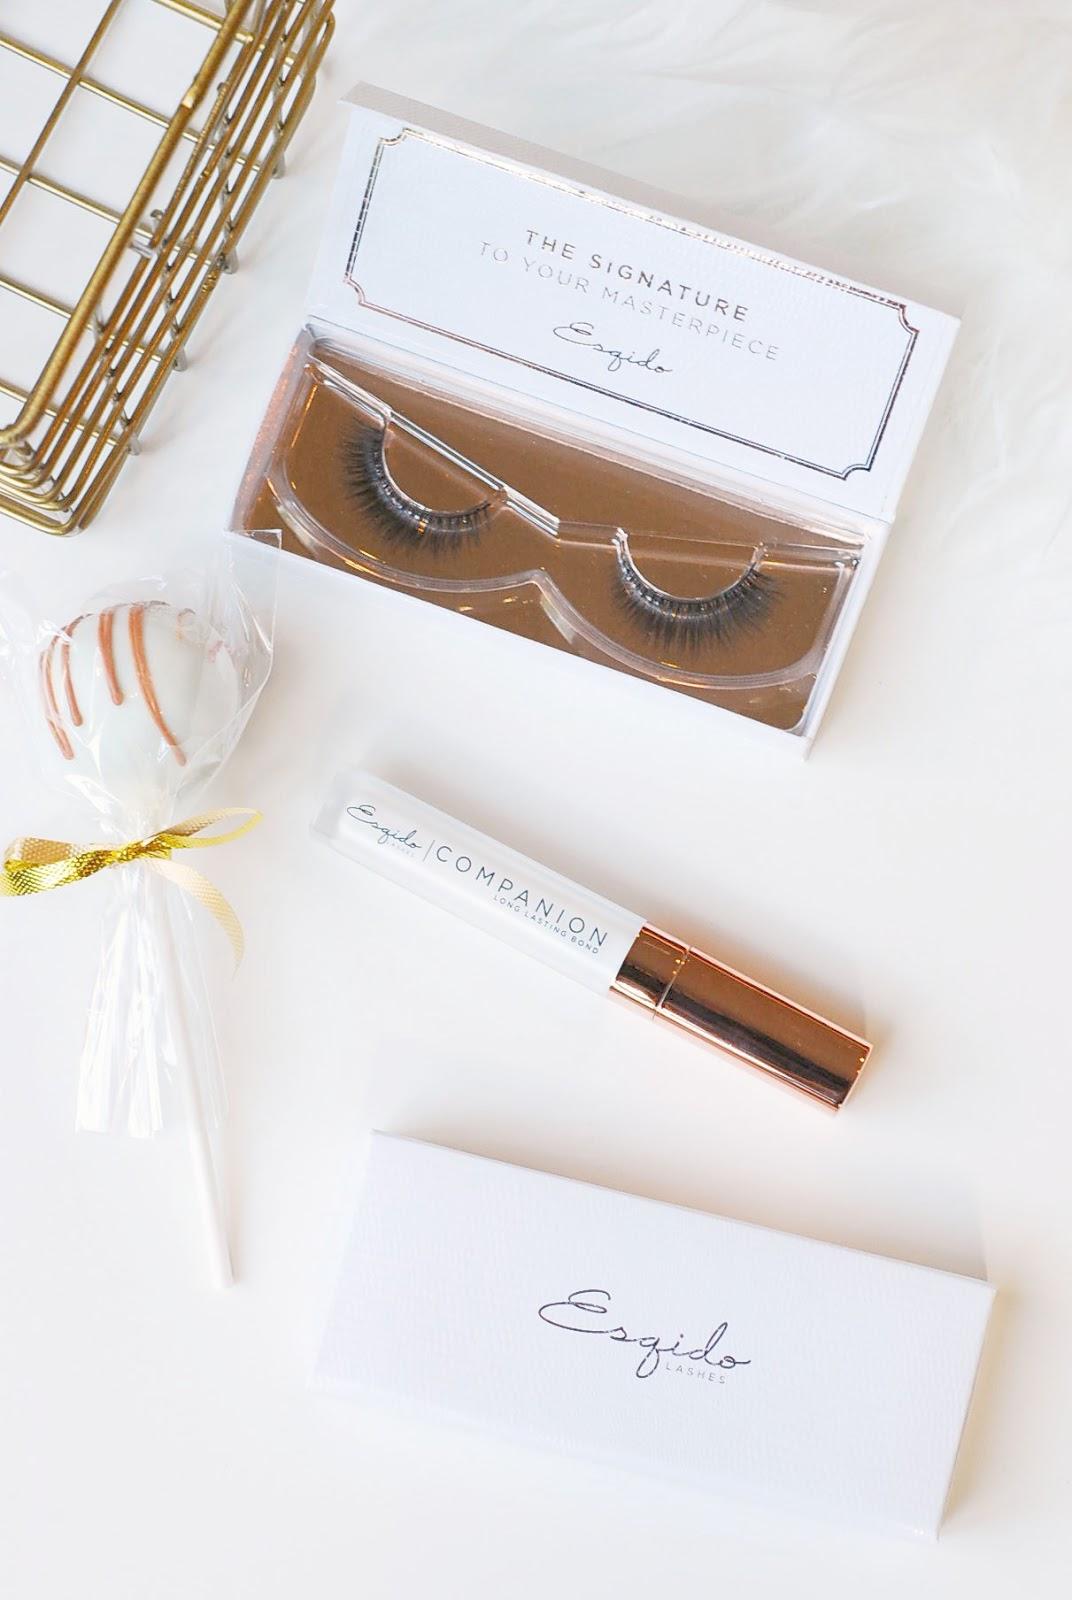 how to wear esqido mink false lashes